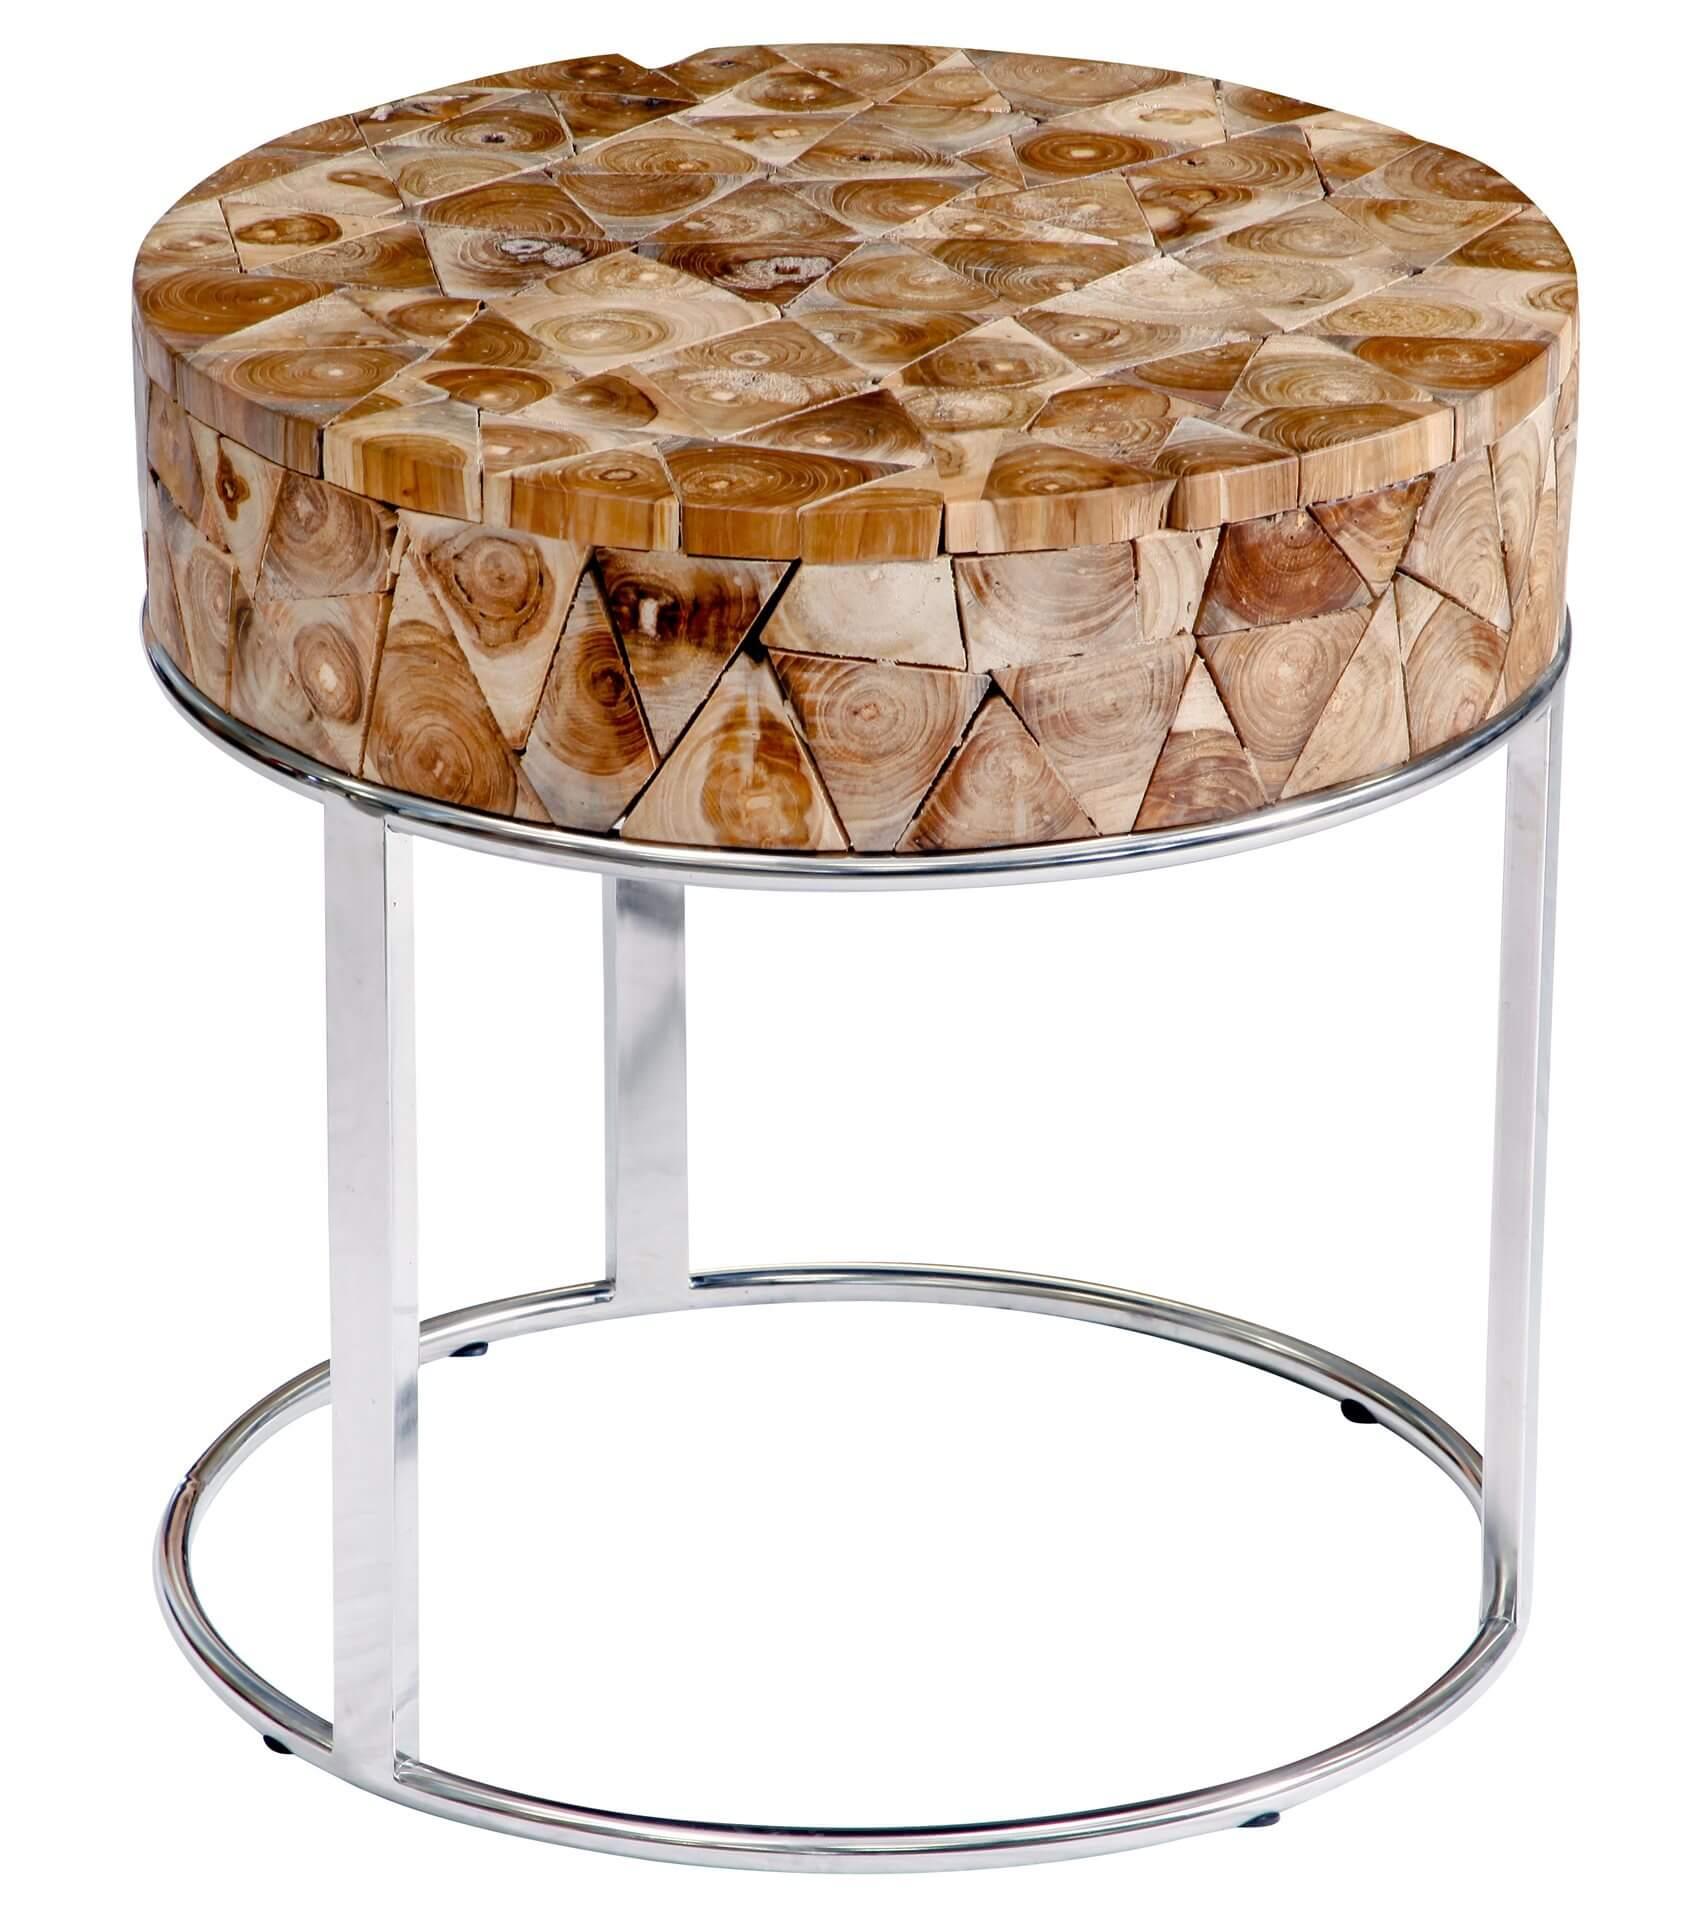 Unique_Round_Side_Table